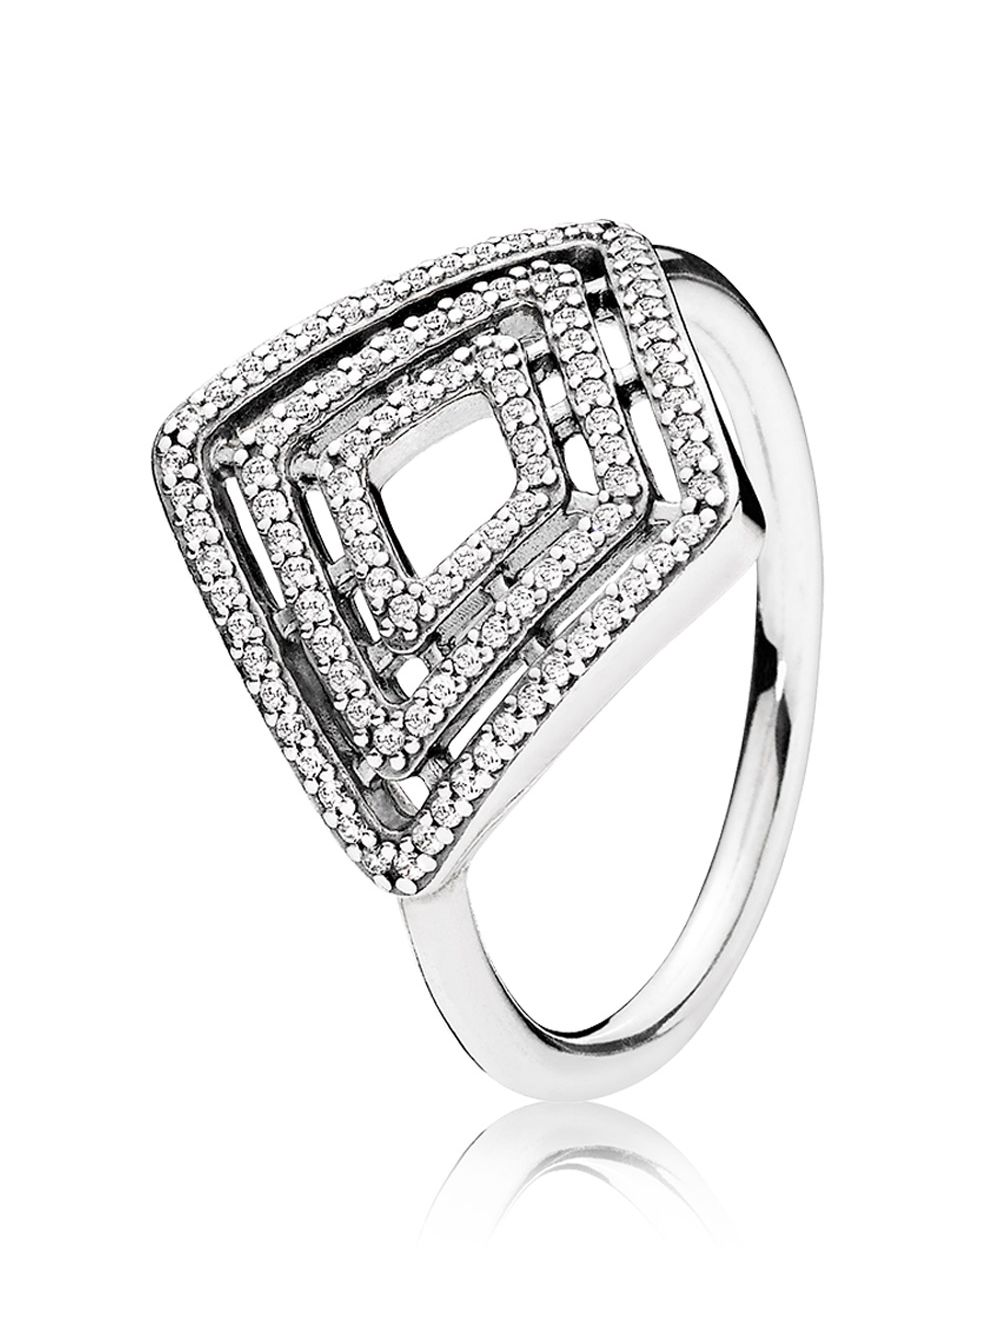 9680d5763c5db Pandora 196210CZ Ladies Ring Geometrical Lines